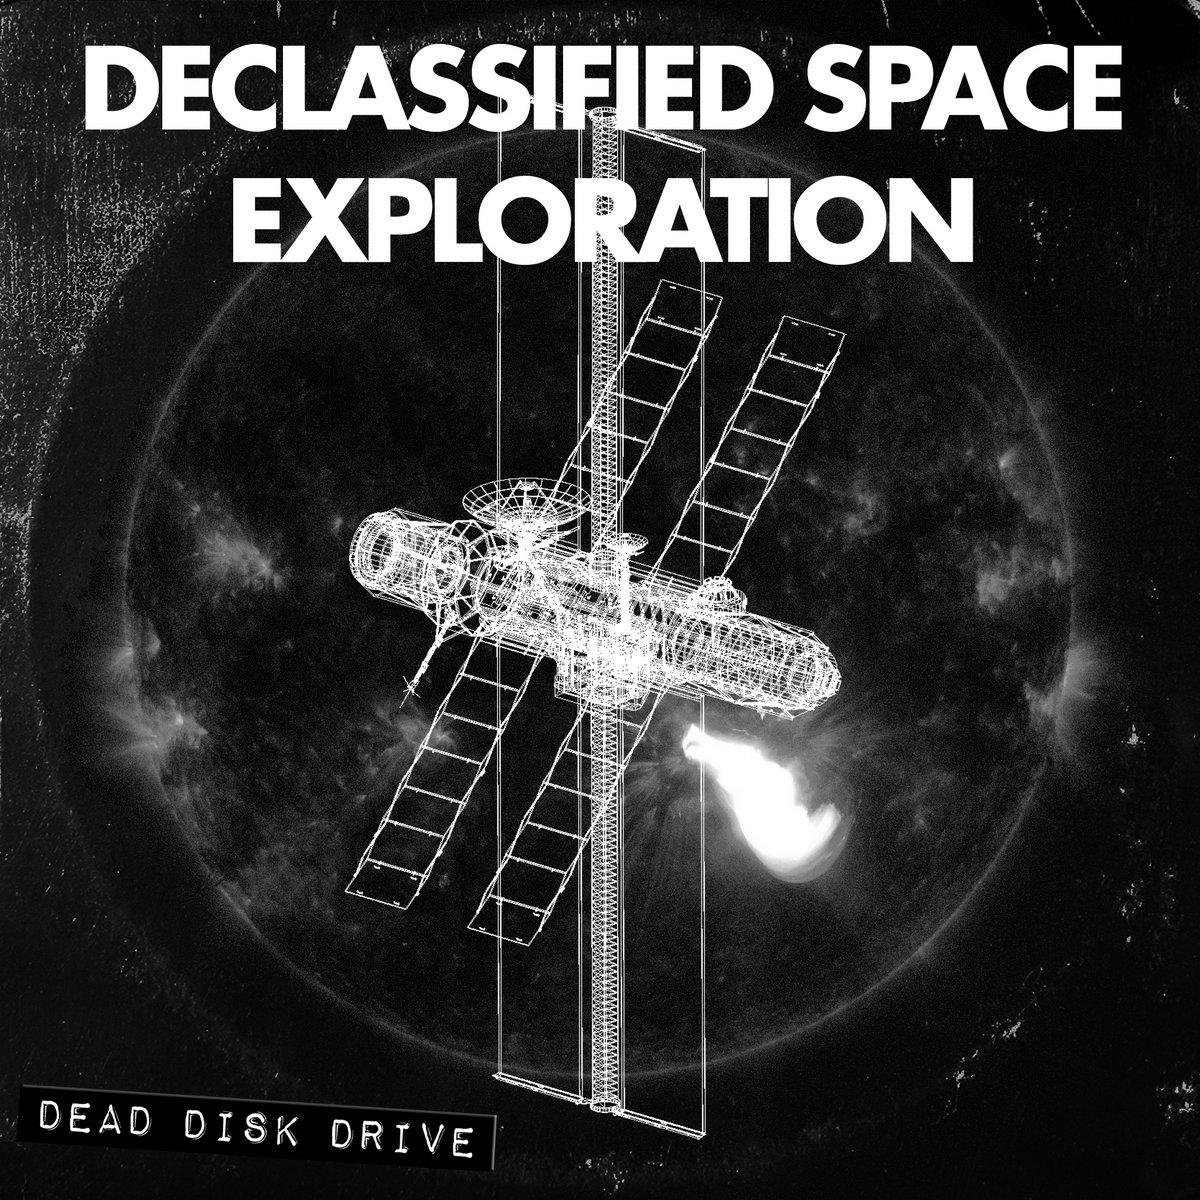 Declassified Space Exploration | Dead Disk Drive